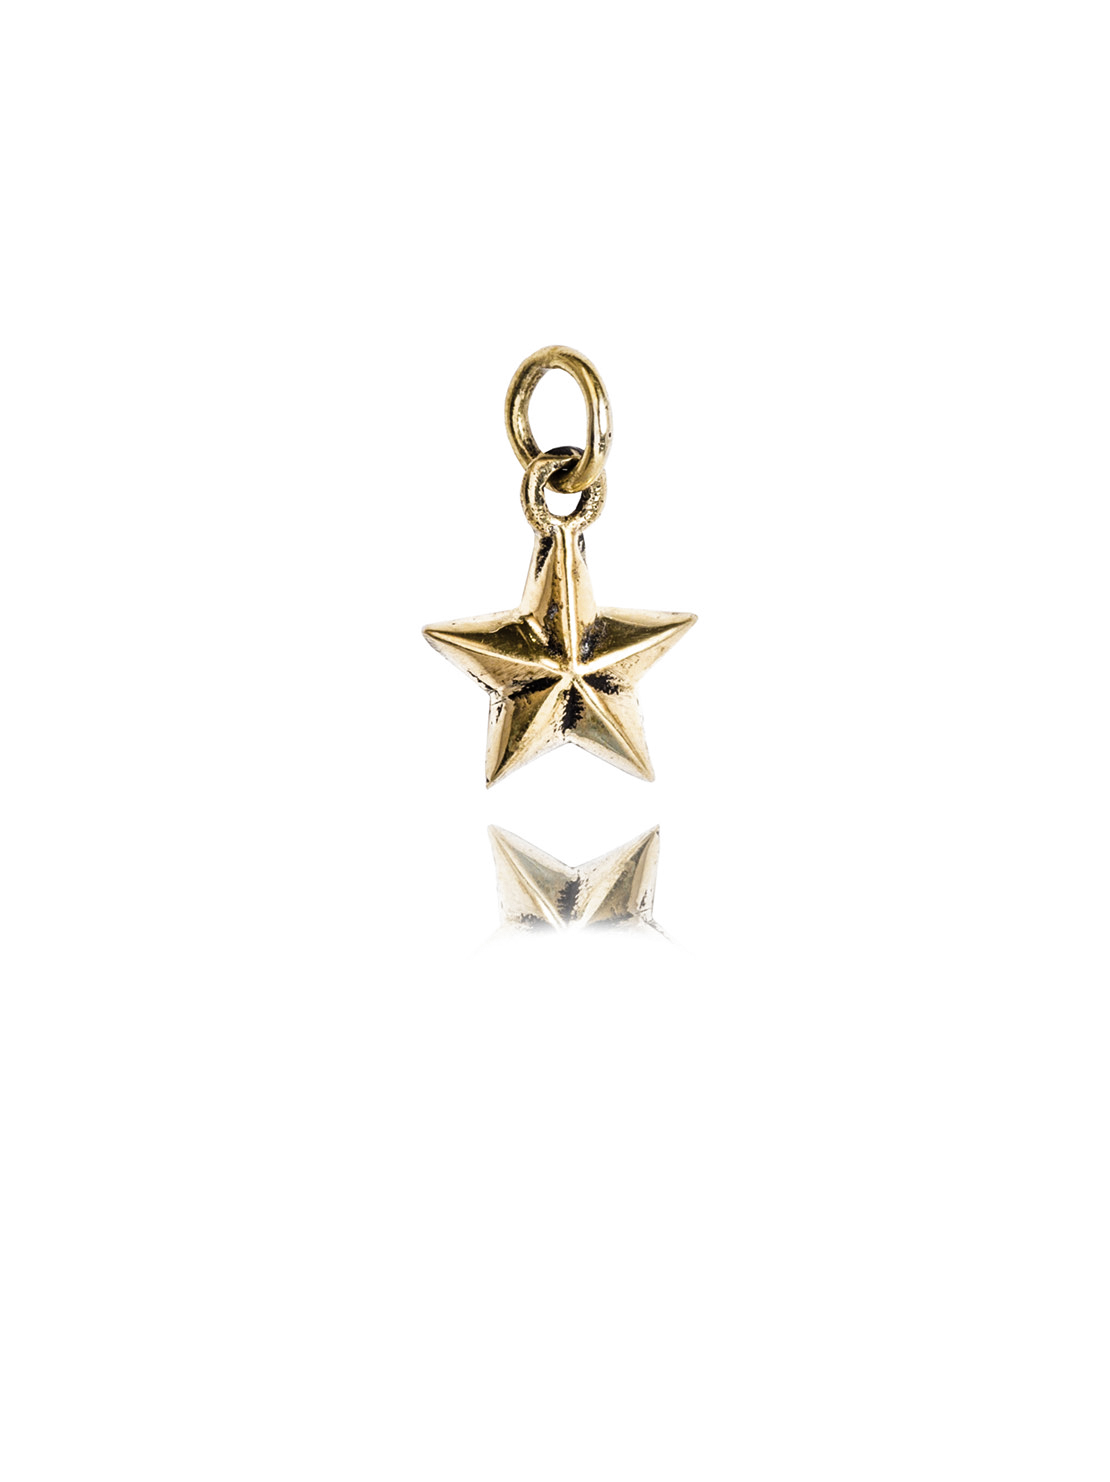 Small Brass Star Charm